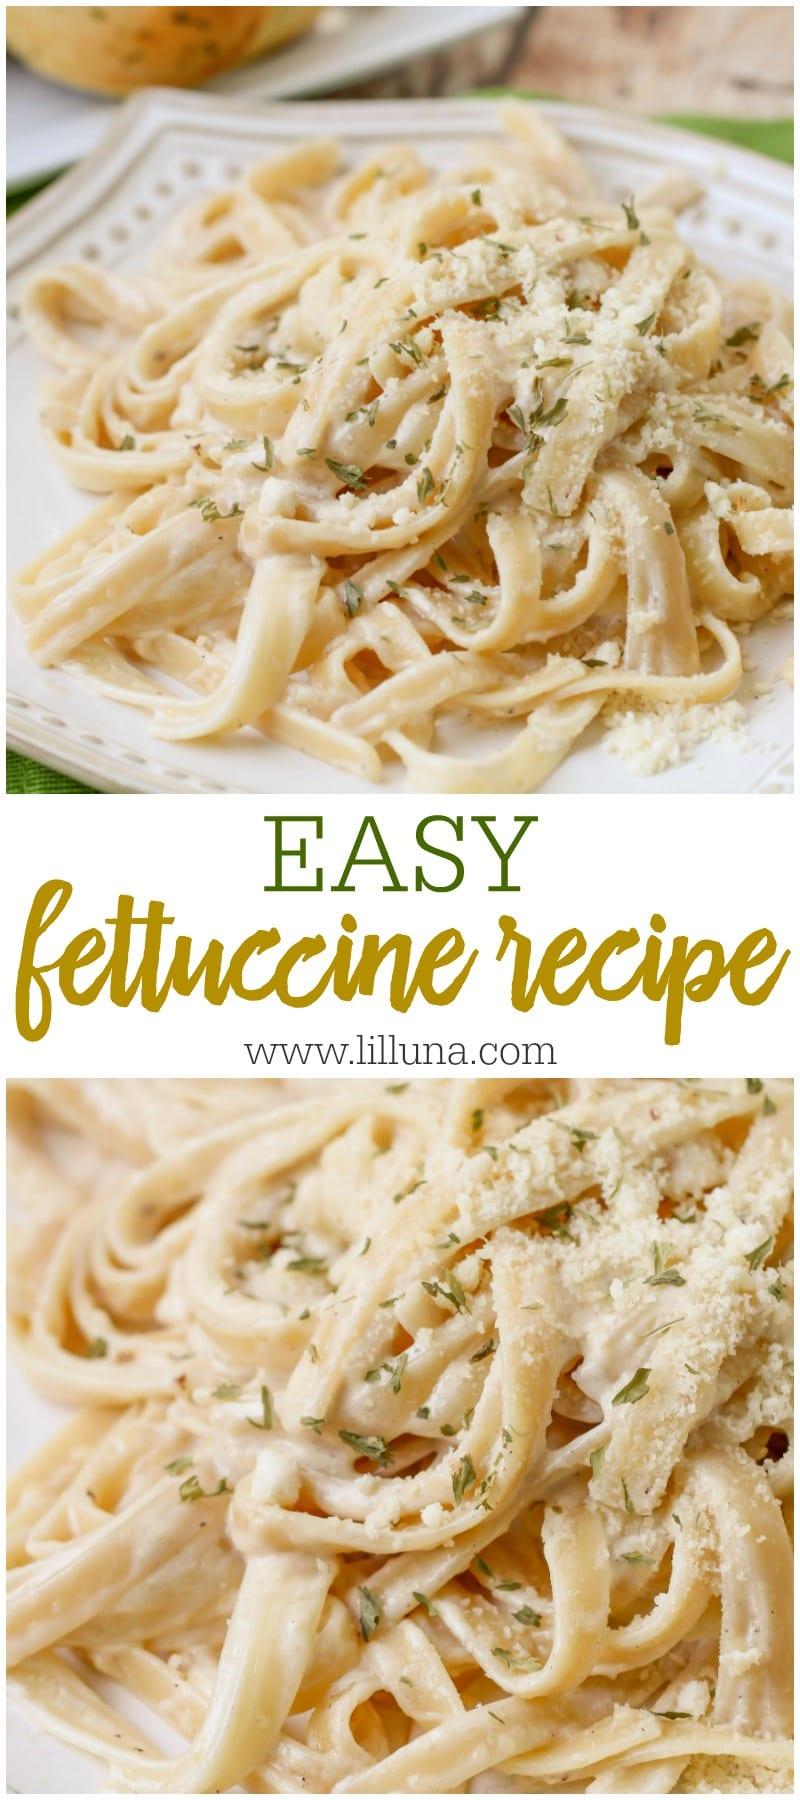 Easy Fettuccine Alfredo